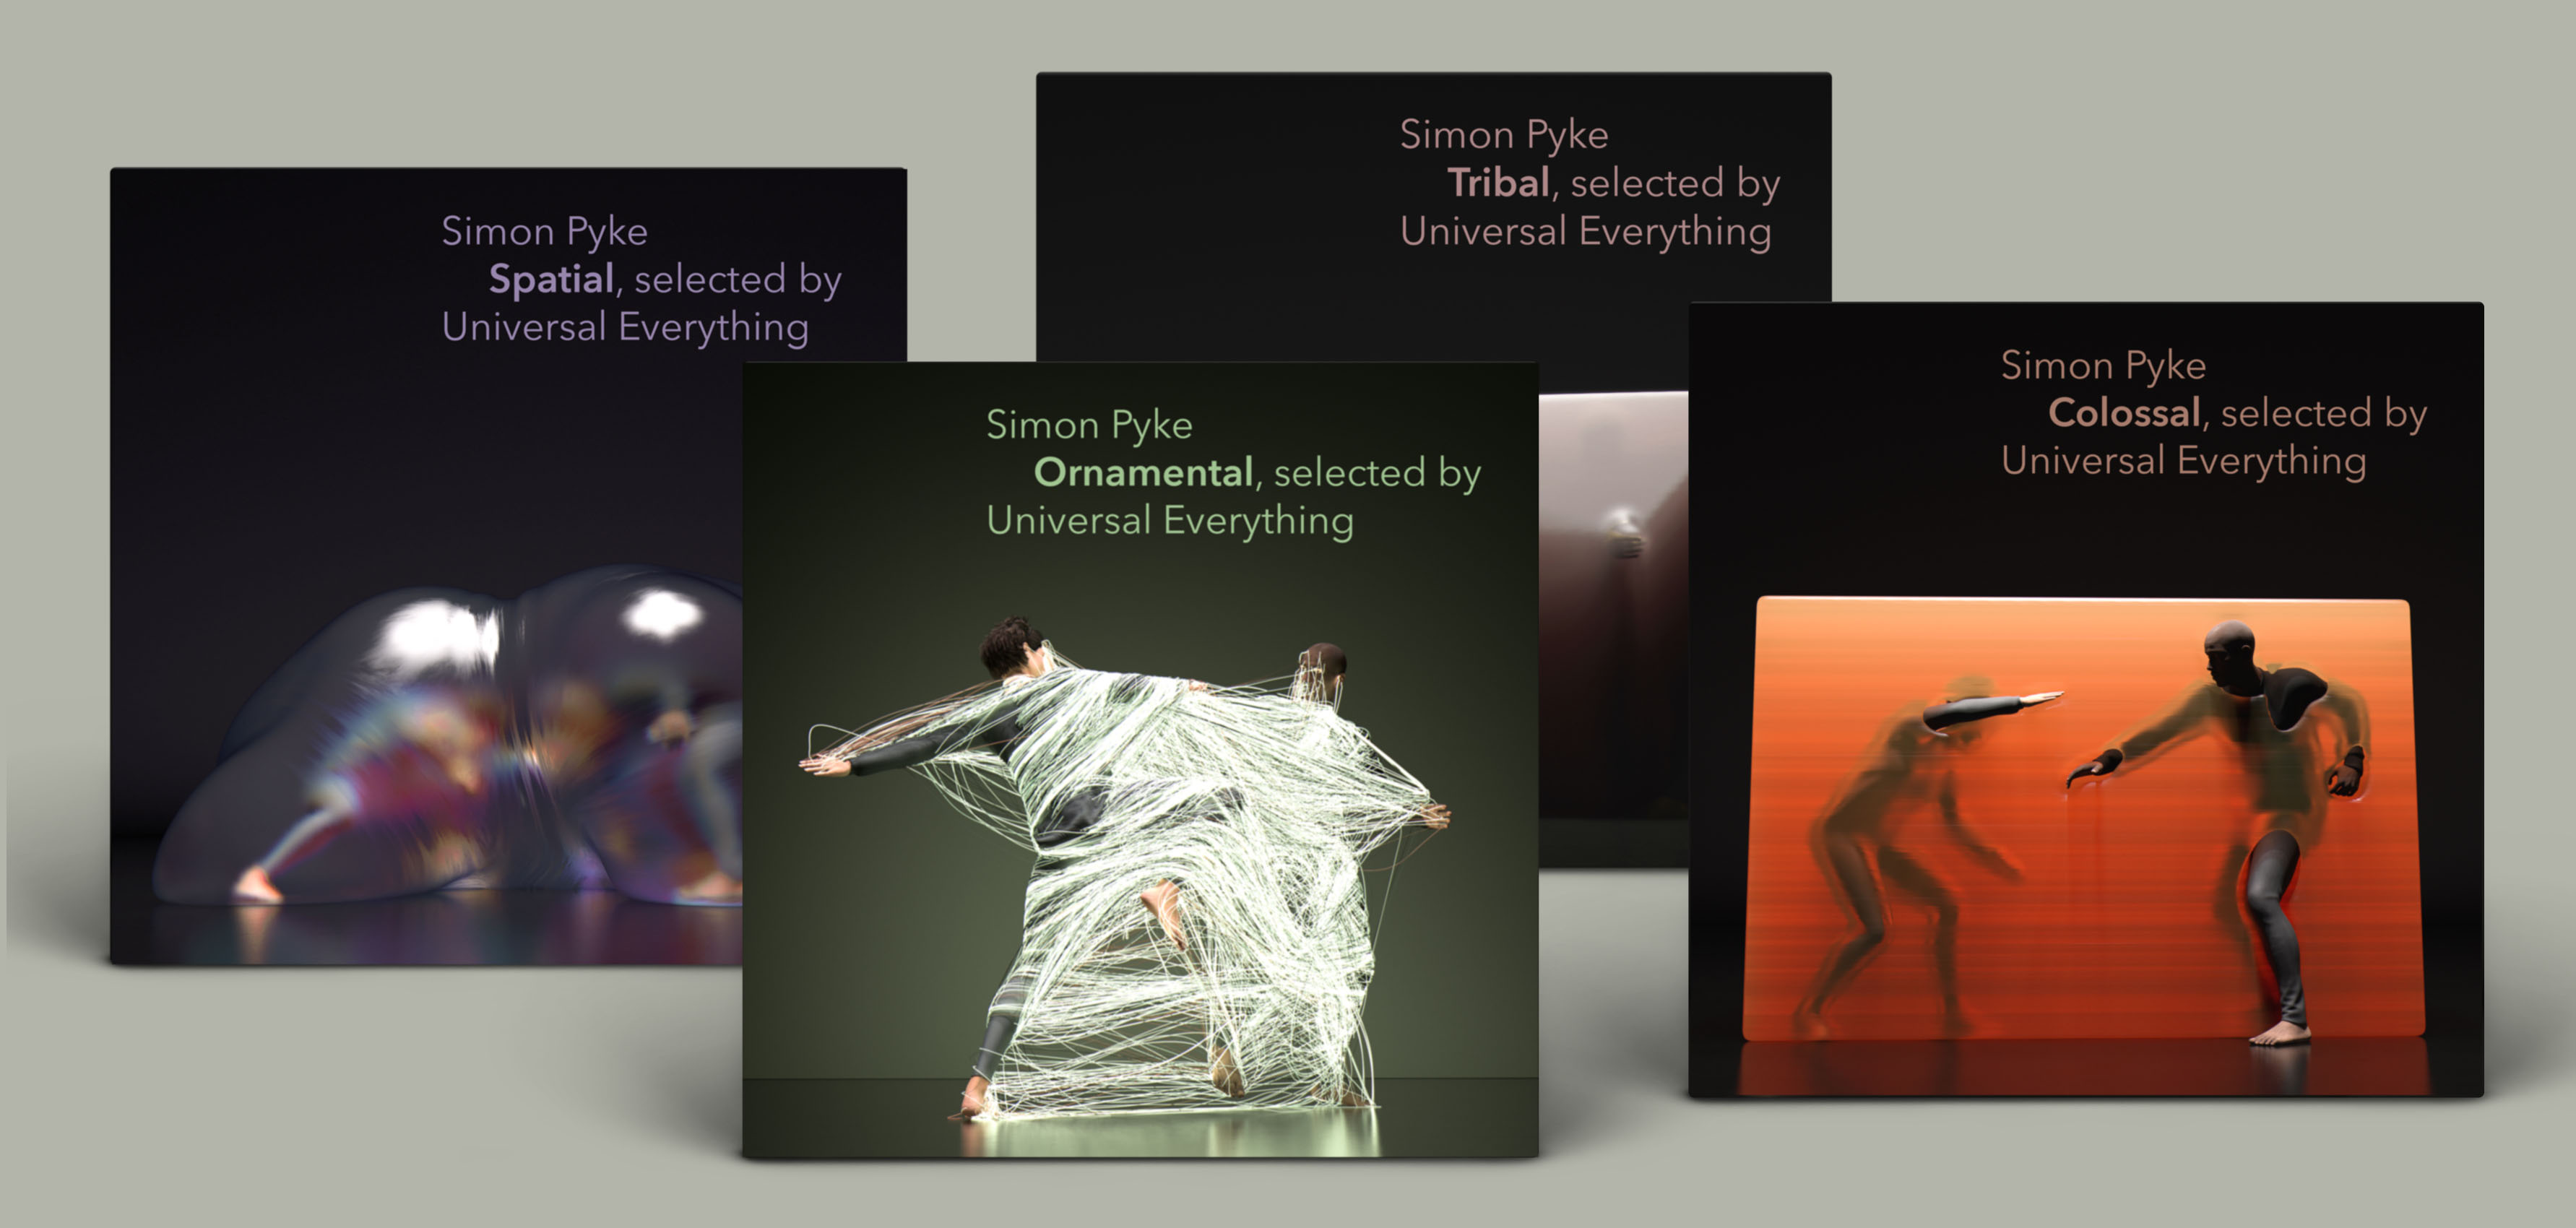 Spatial, Ornamental, Tribal, Colossal albums